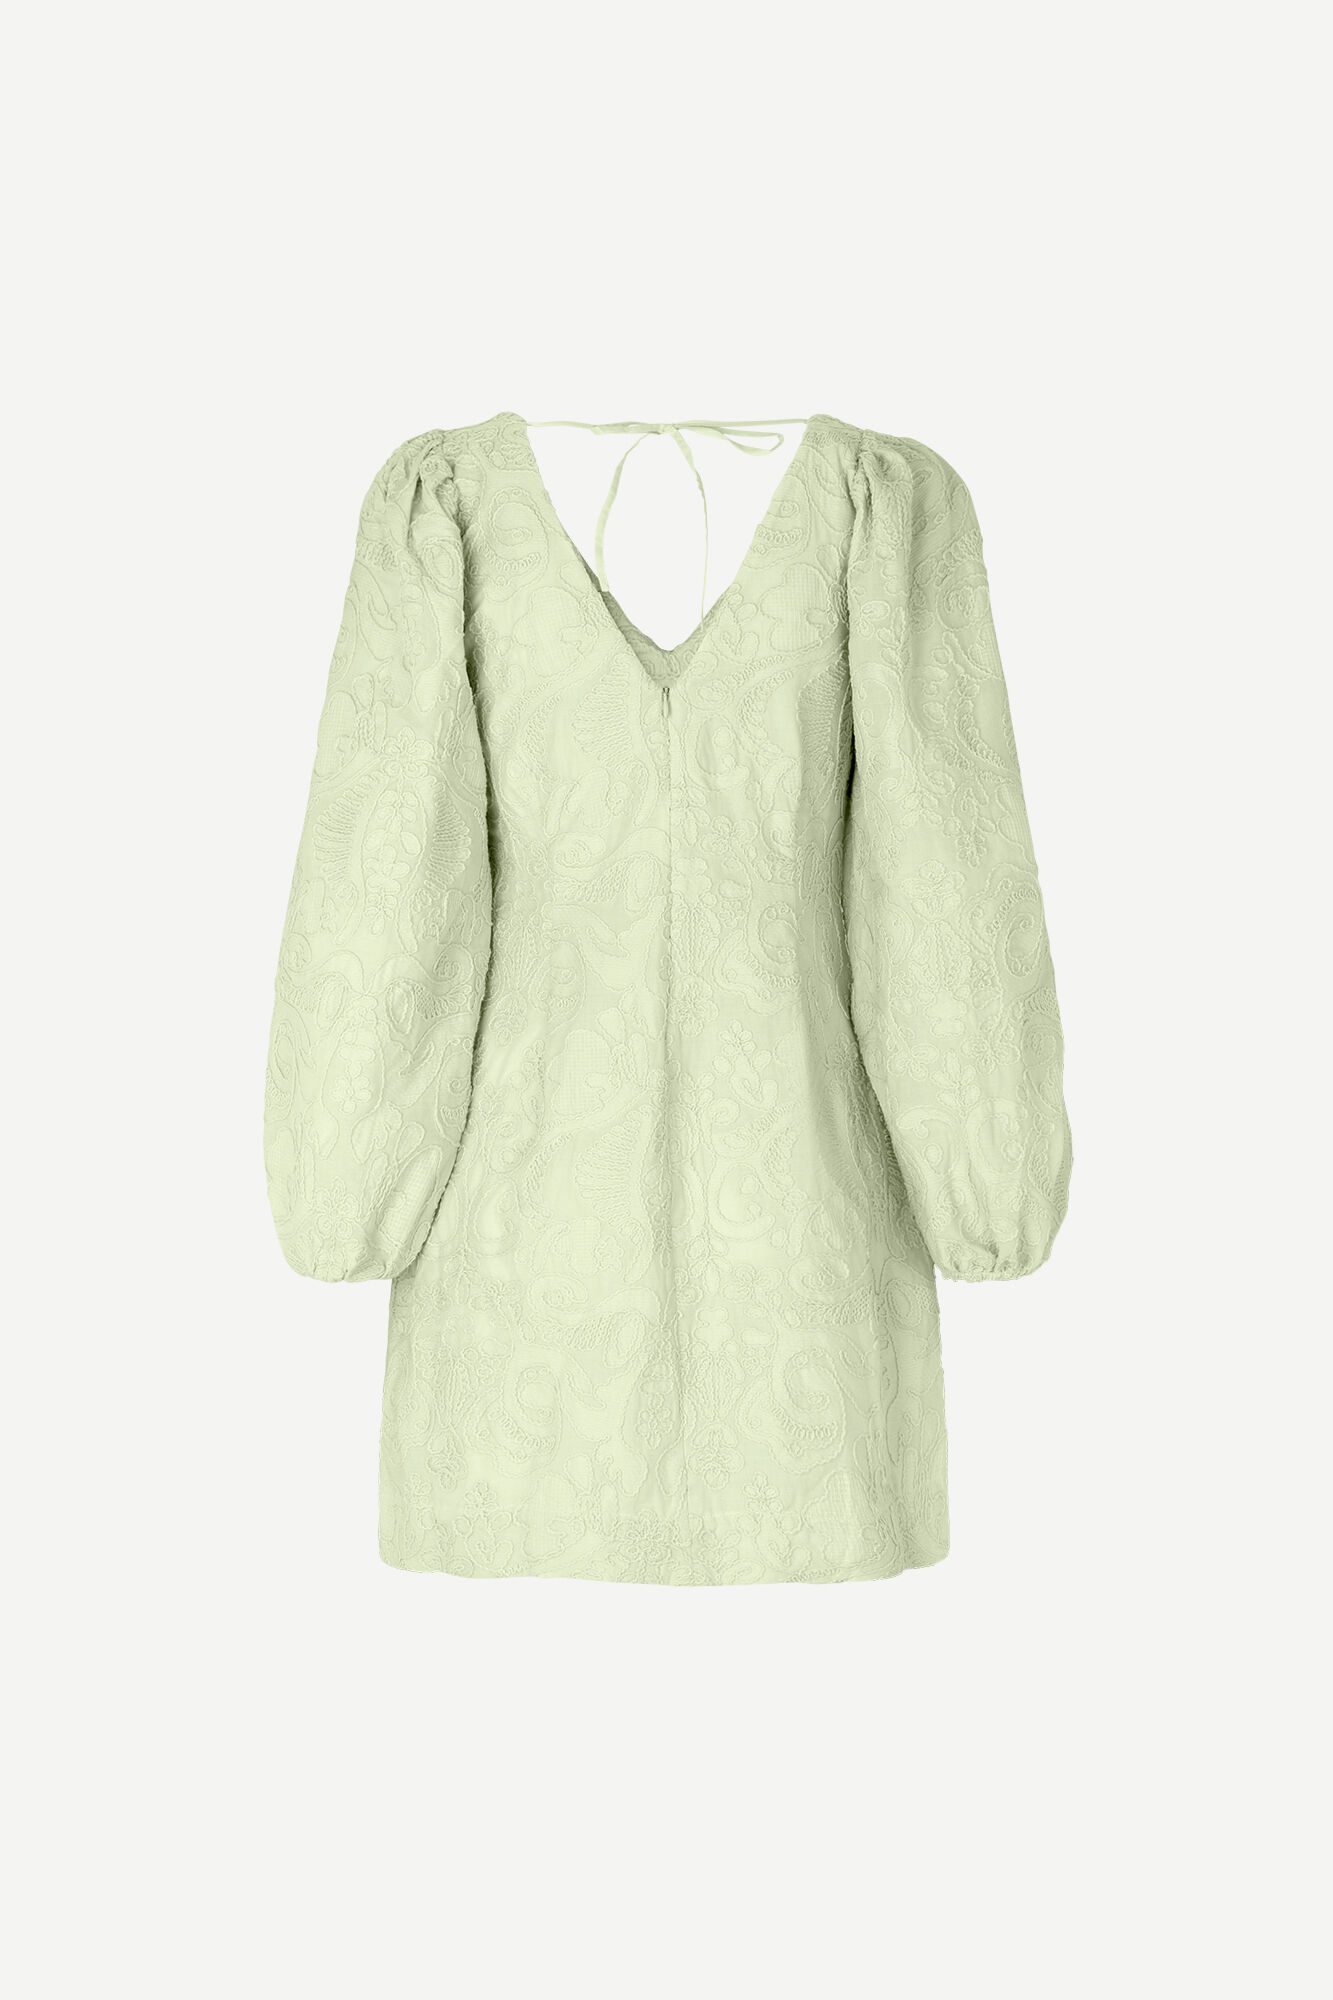 Anai dress 13089, FOG GREEN